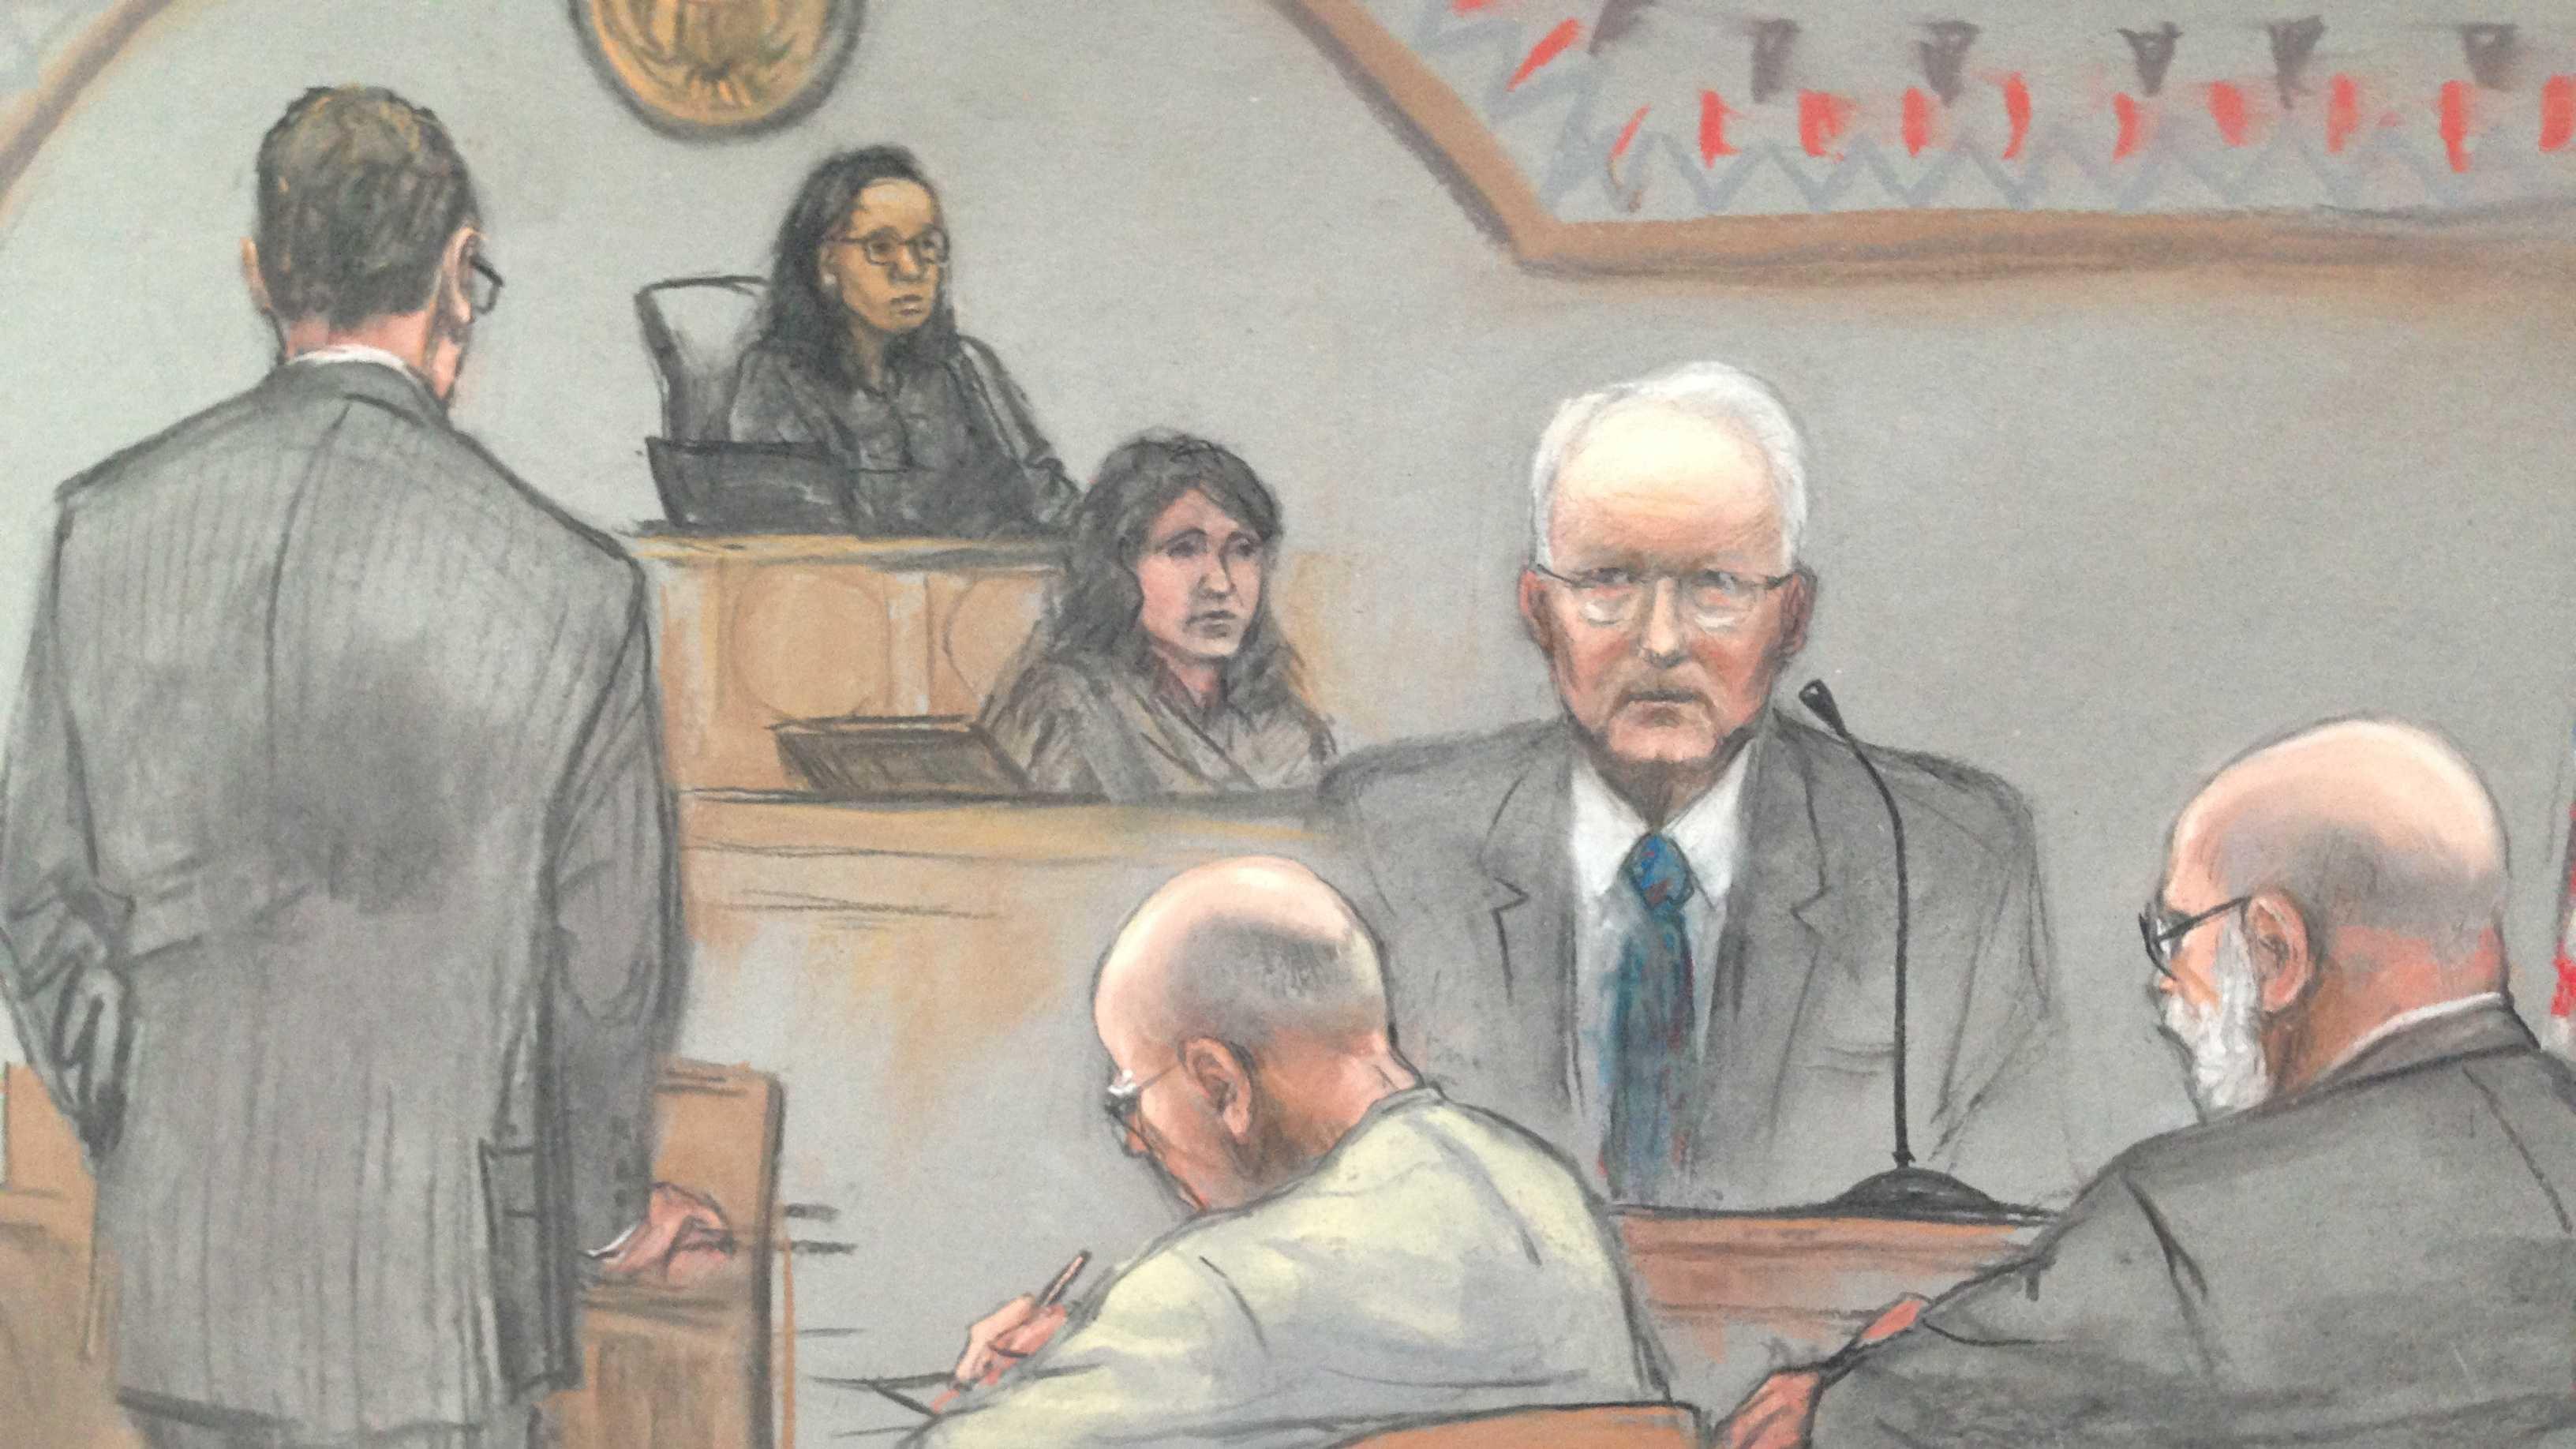 Bulger Sketch John Morris Testifies Bulger Watches 070113.JPG